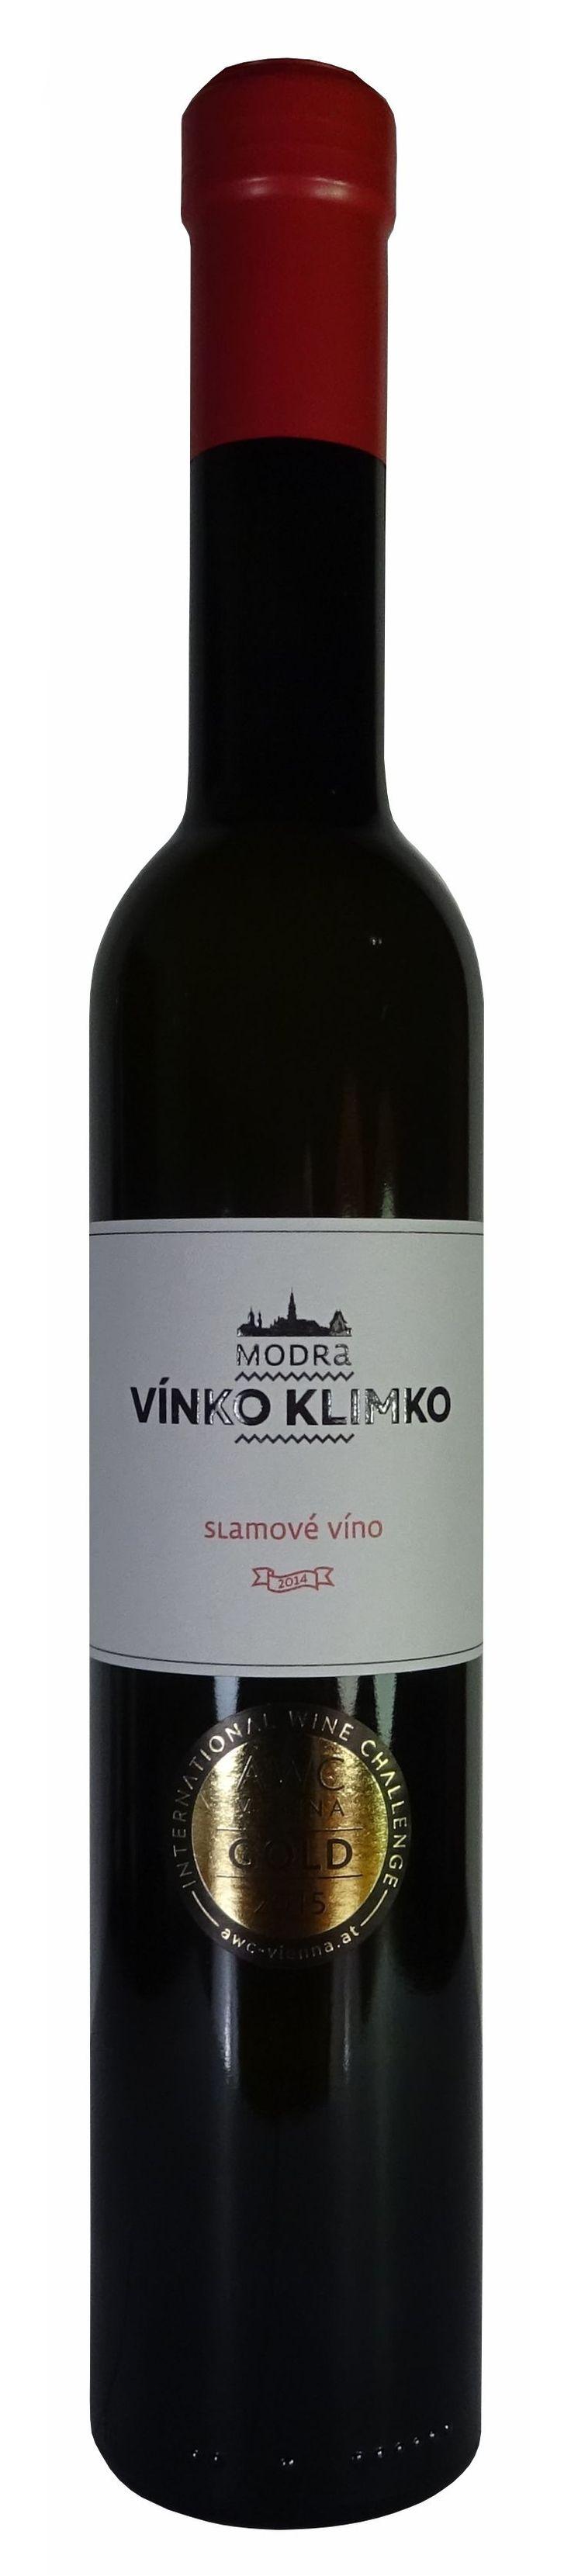 K výnimočnej udalosti patrí i výnimočné víno. Objednajte si od nás Veltlínske zelené, z vinárstva Klimko, ročník 2014. http://bit.ly/veltlinske_zelene #wine #wineexpert #wineexpertsk #wineexperteu #winelovers #vino #slovakiawine #veltlinske #drinkwine